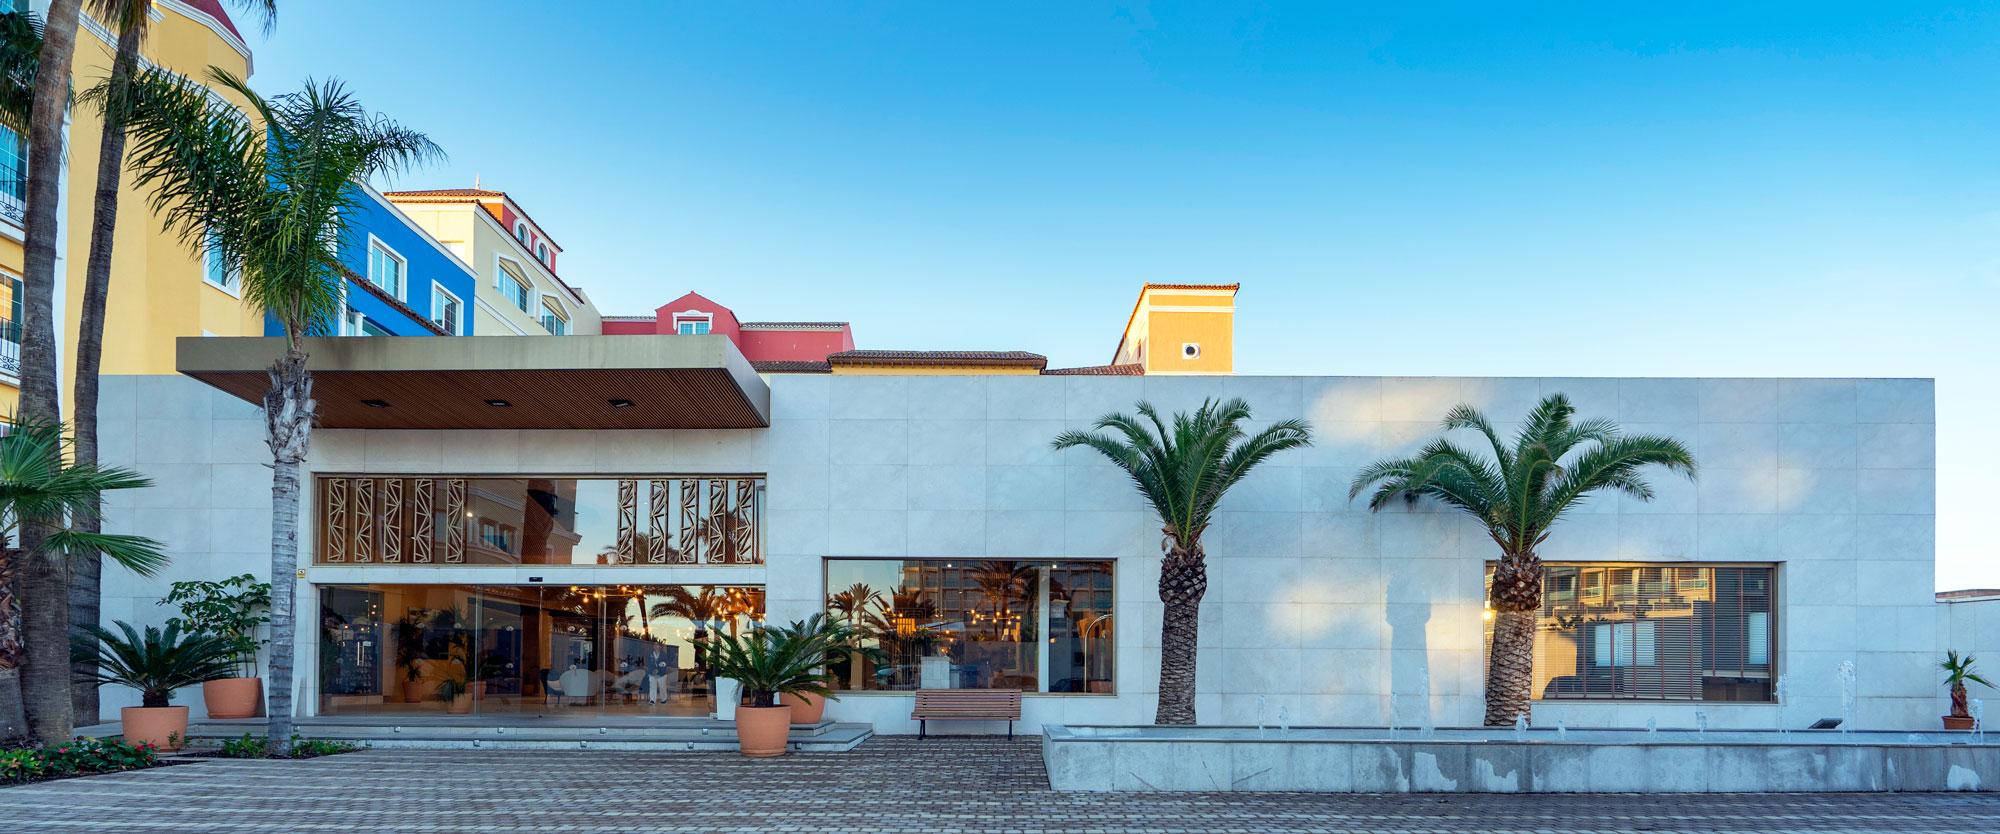 Hotel Mediterráneo  - Hotel Mediterraneo Park 2 Dekton Silestone Piedra Natural Cosentino 182